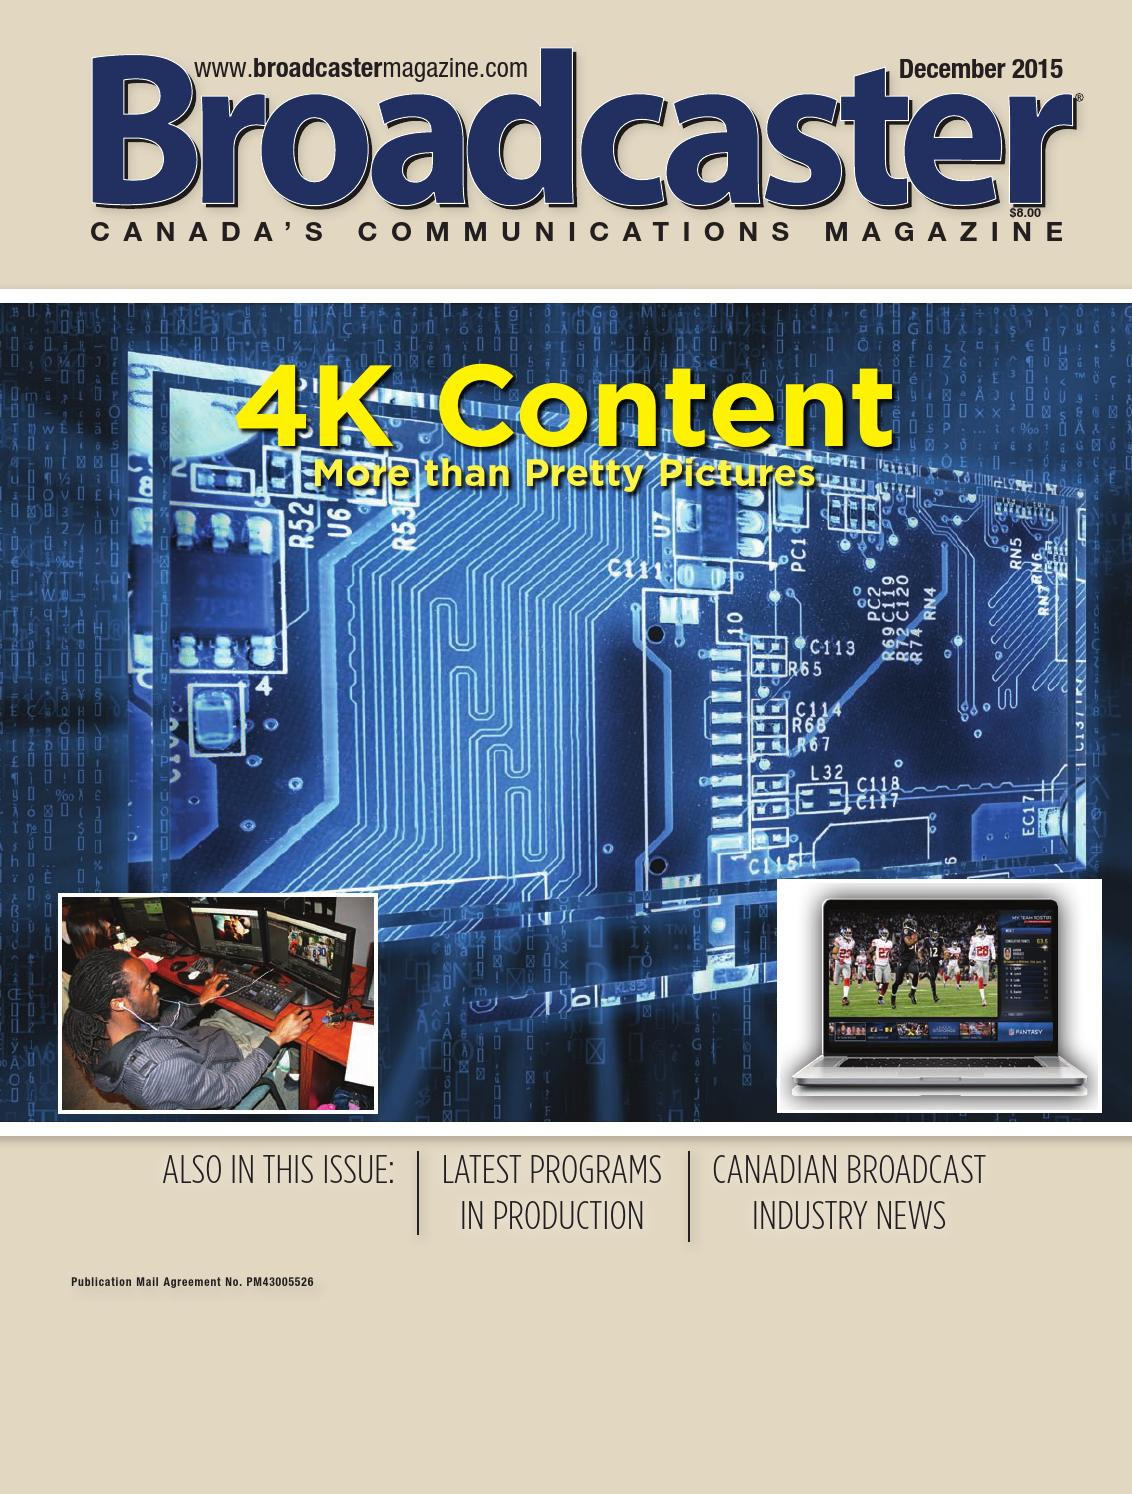 Broadcaster Magazine December 2015 by Annex-Newcom LP - issuu